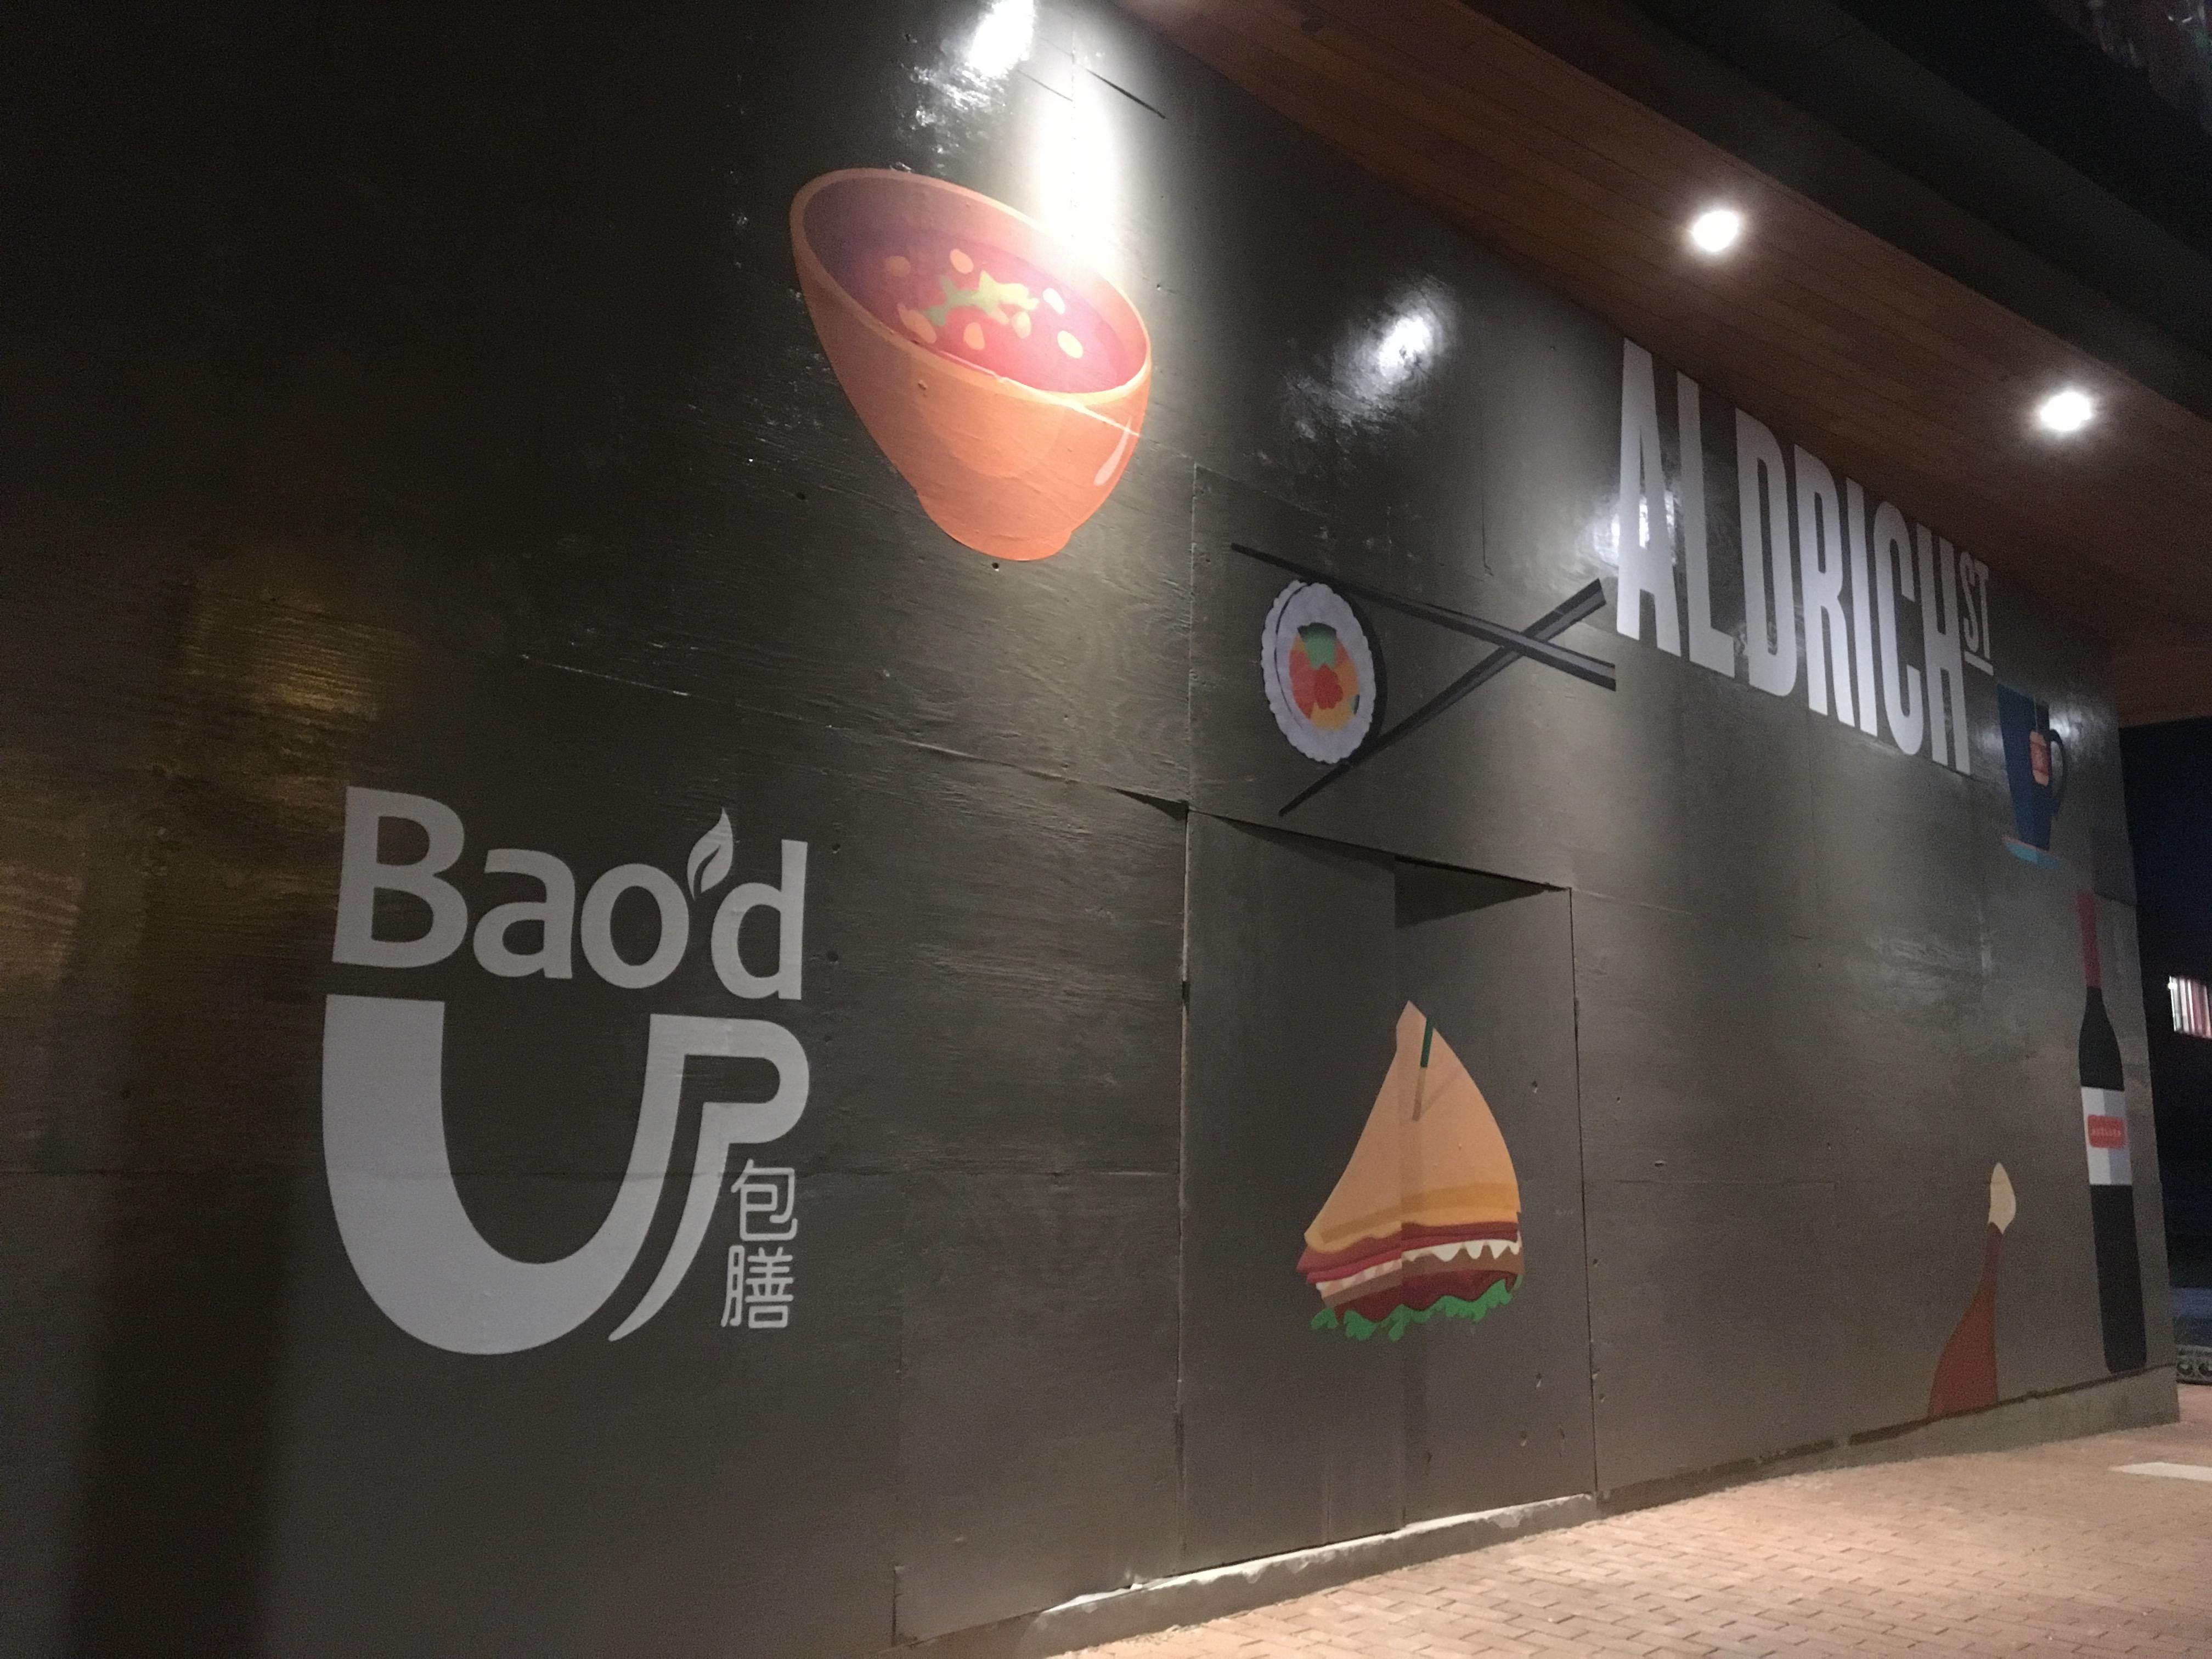 Bao'd Up's plywood